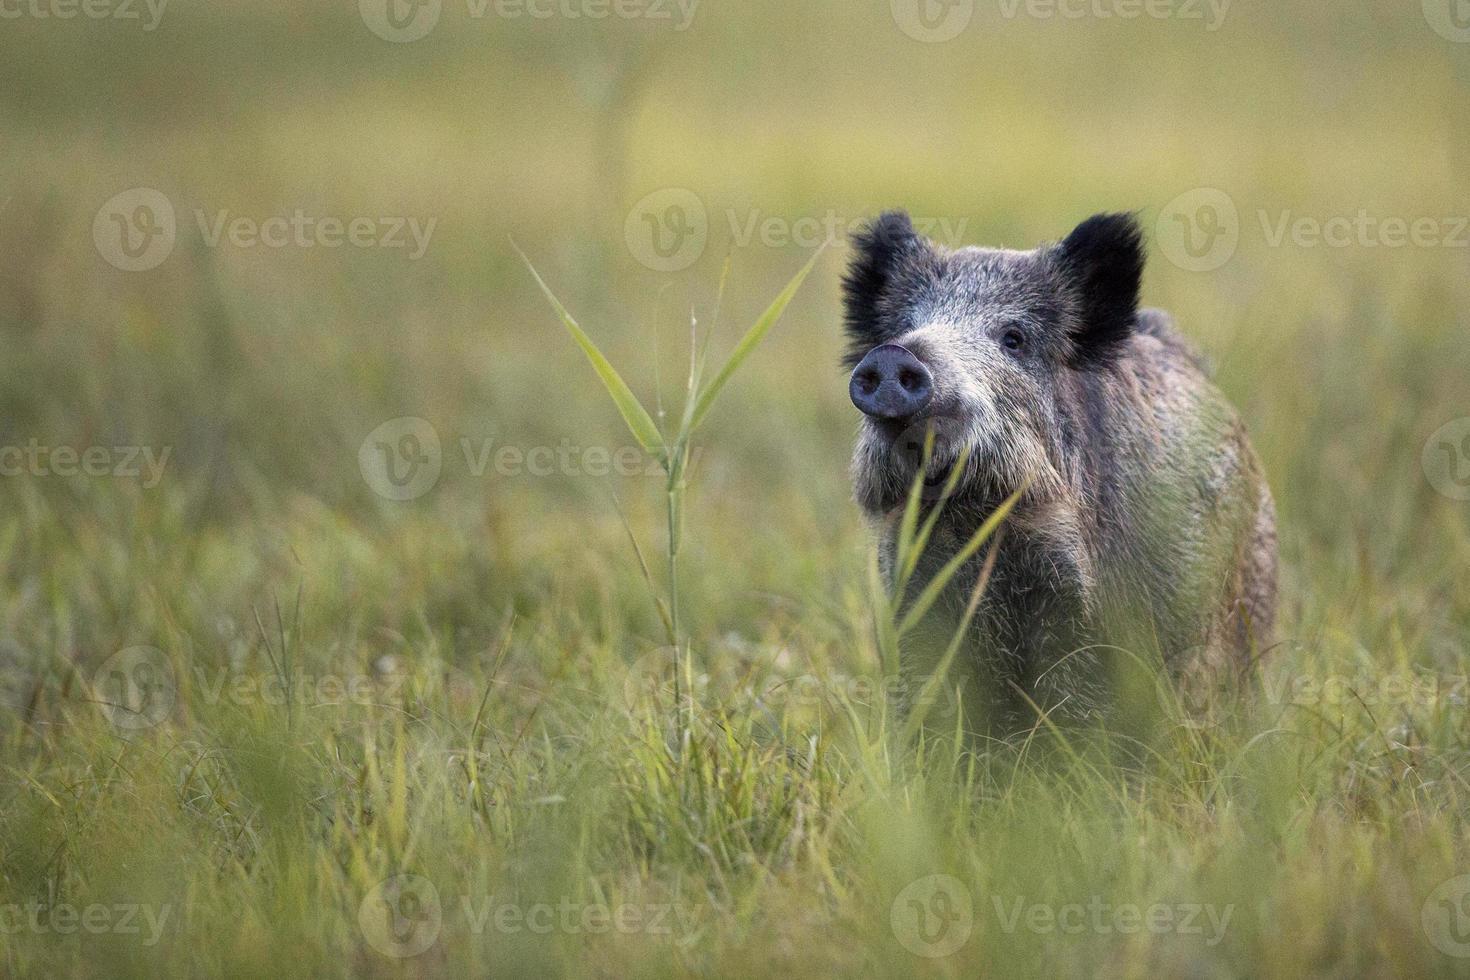 Boar in the wild photo